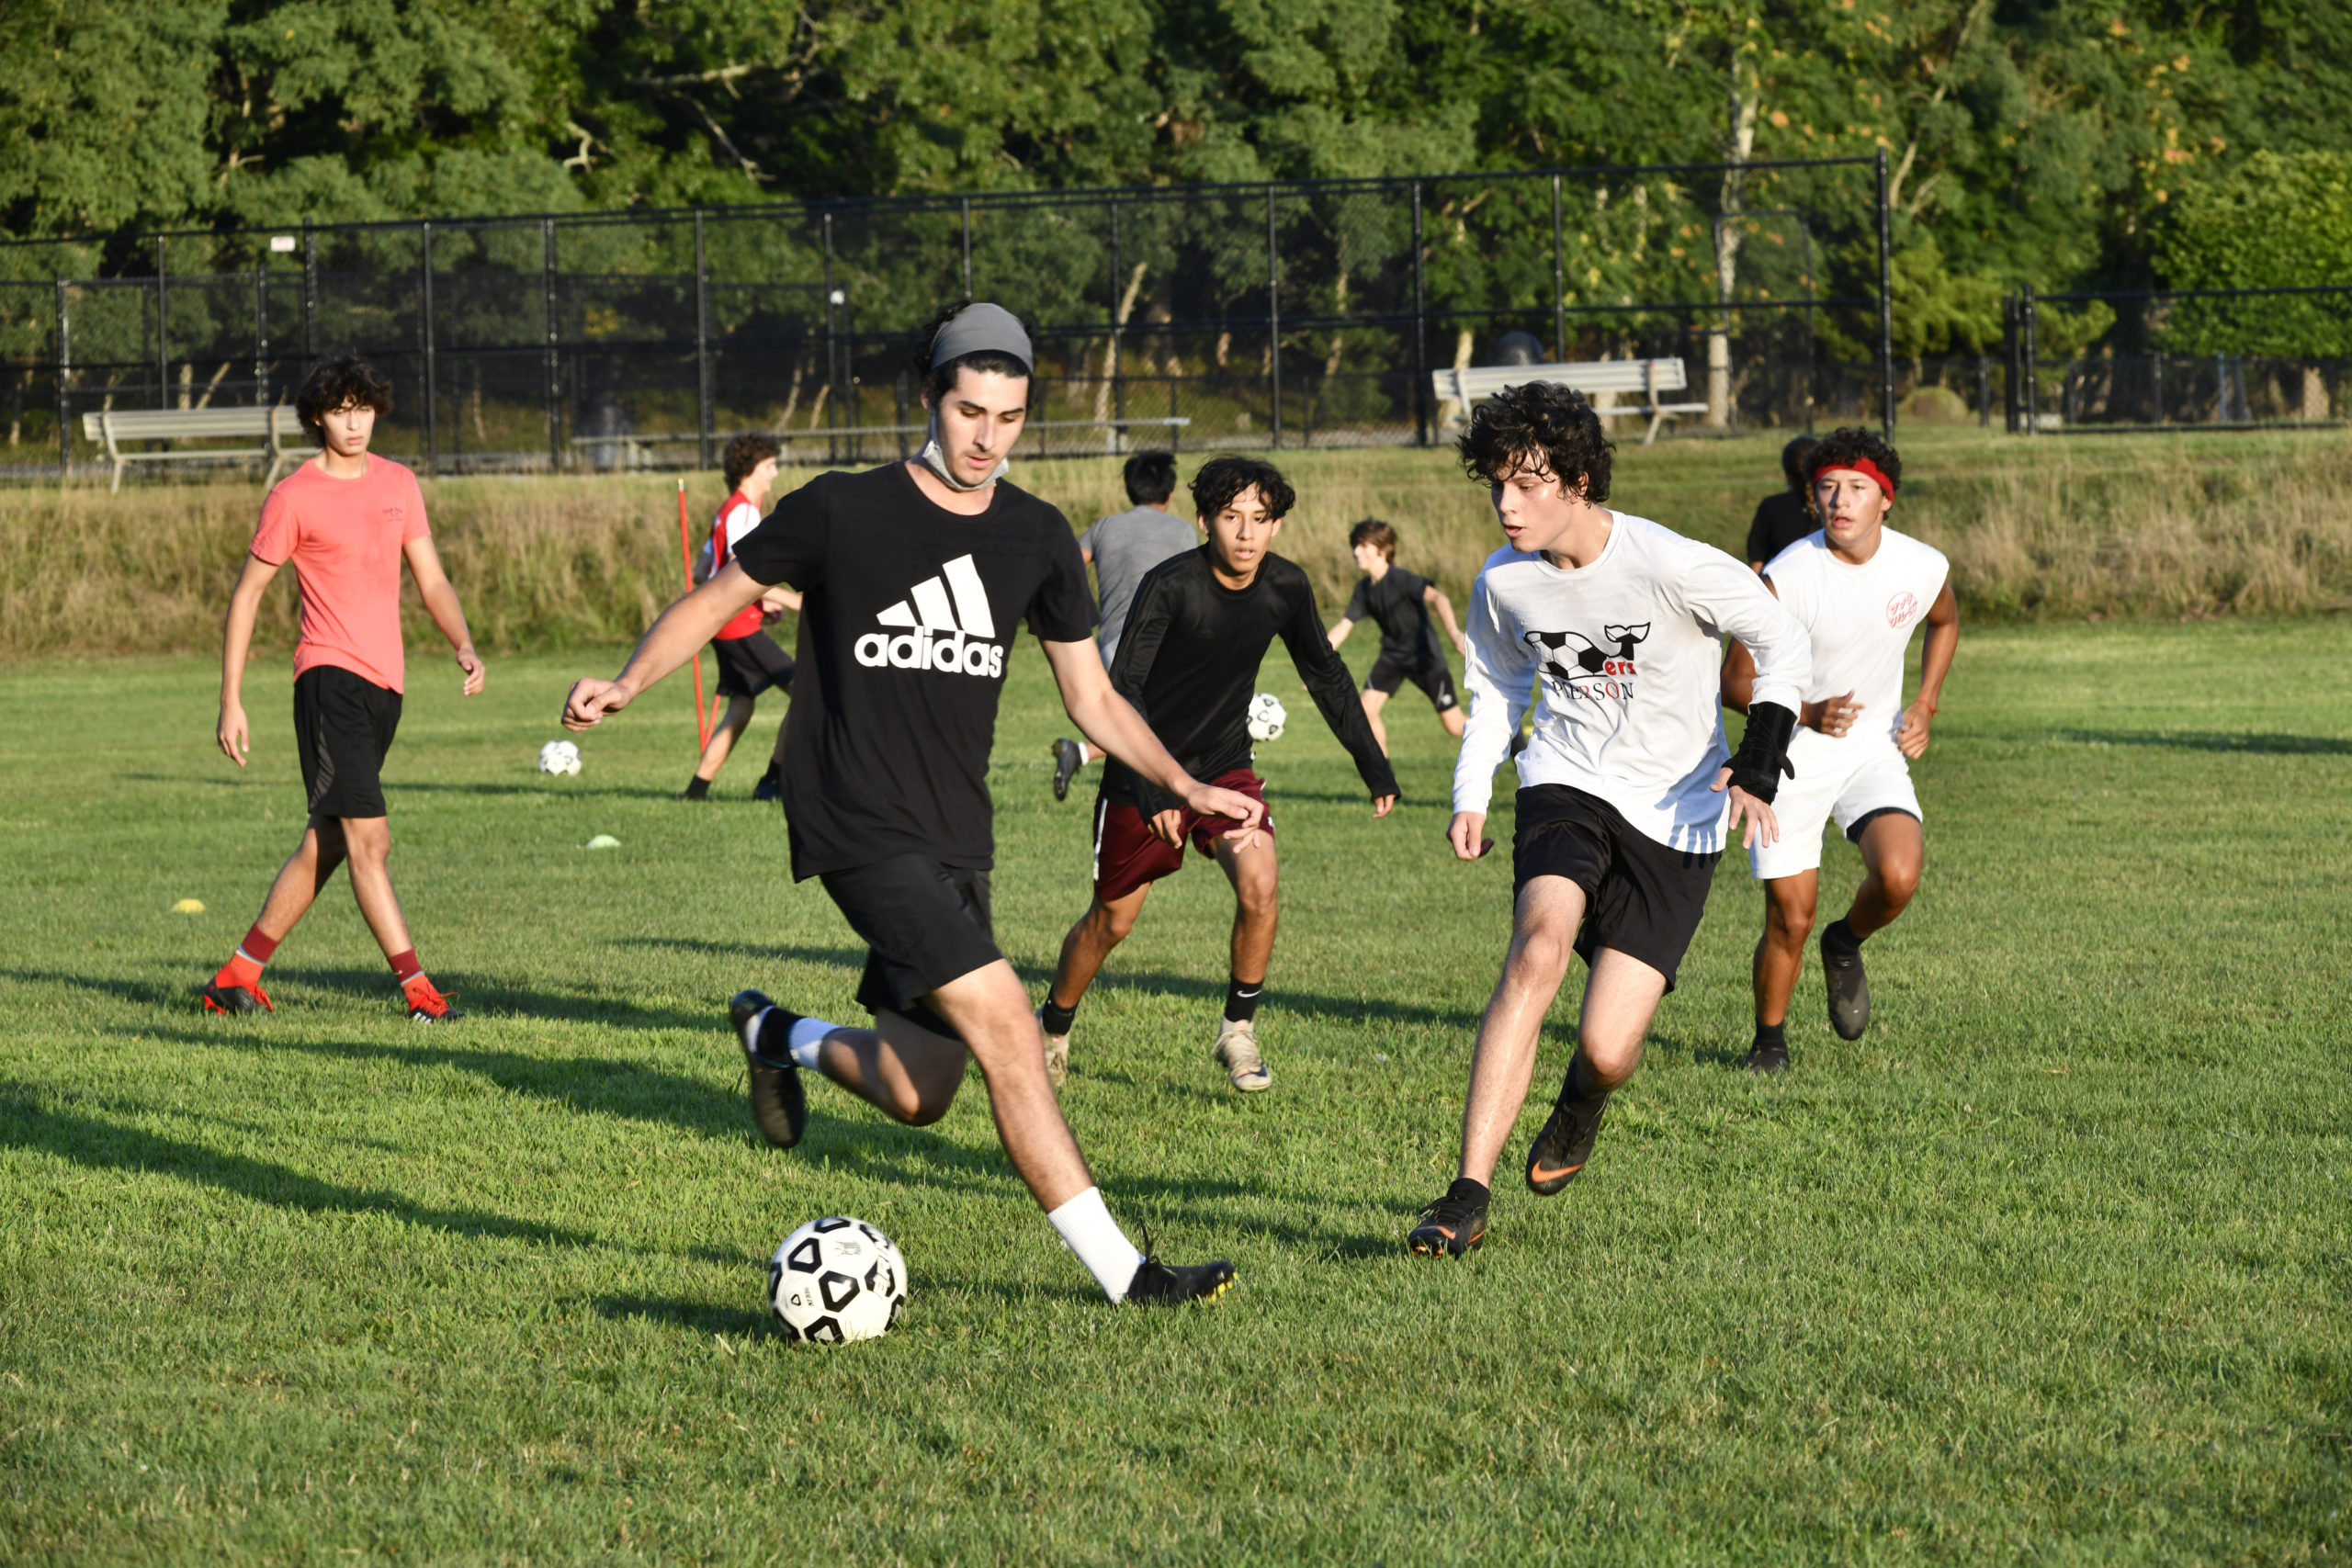 Players practice at Mashashimuet Park in Sag Harbor  DANA SHAW